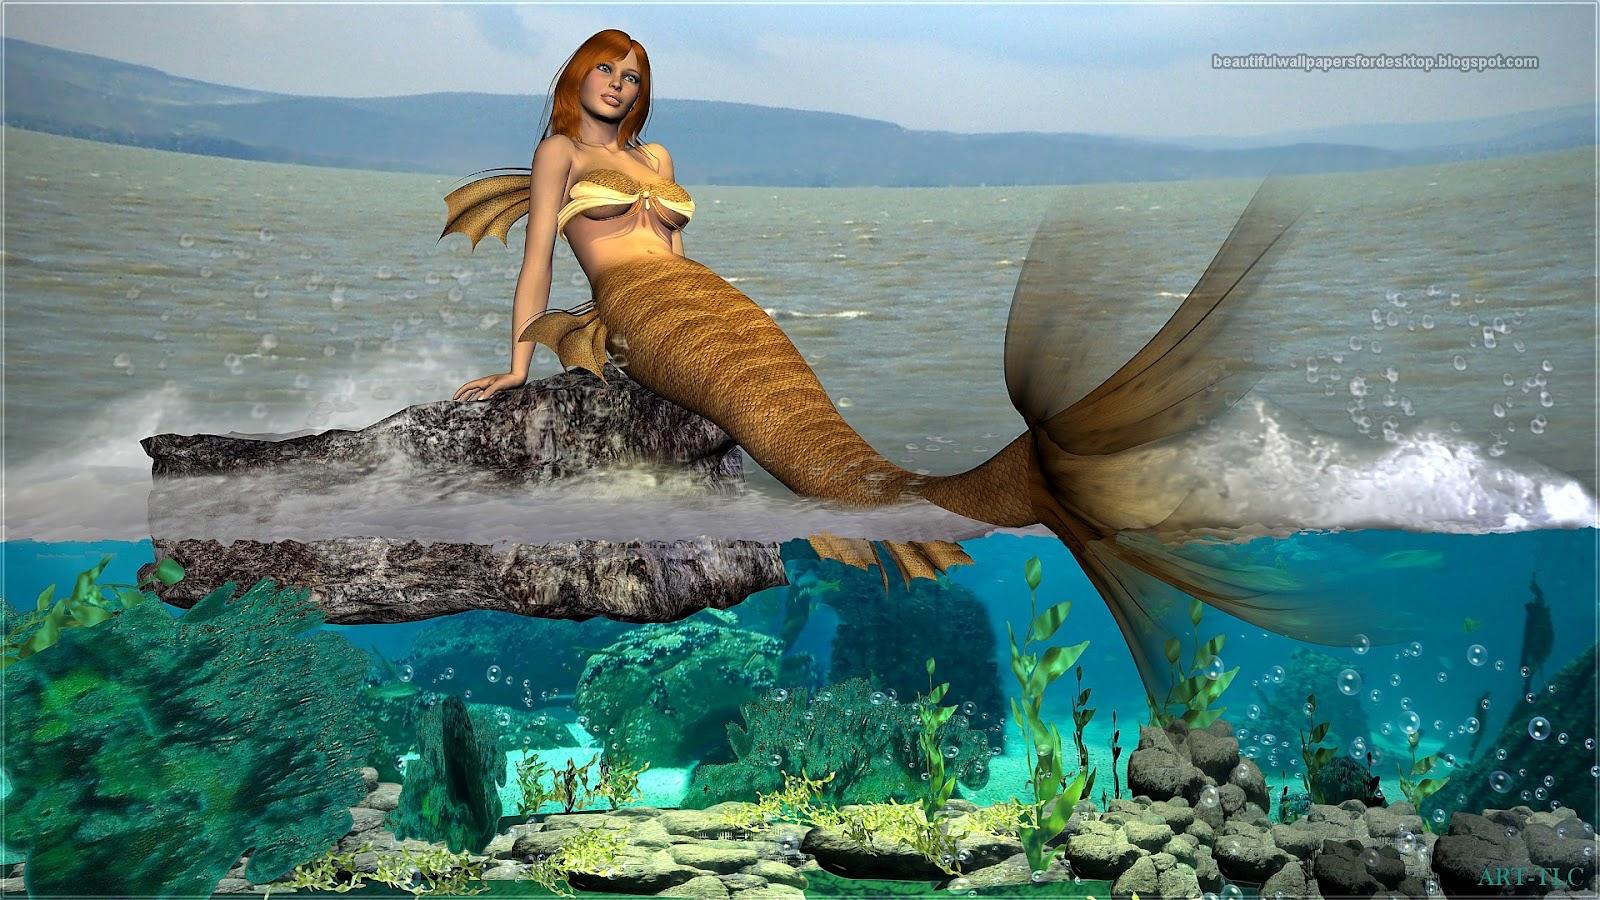 Wwe Wallpapers 2012 3d Labels Mermaids Wallpapers